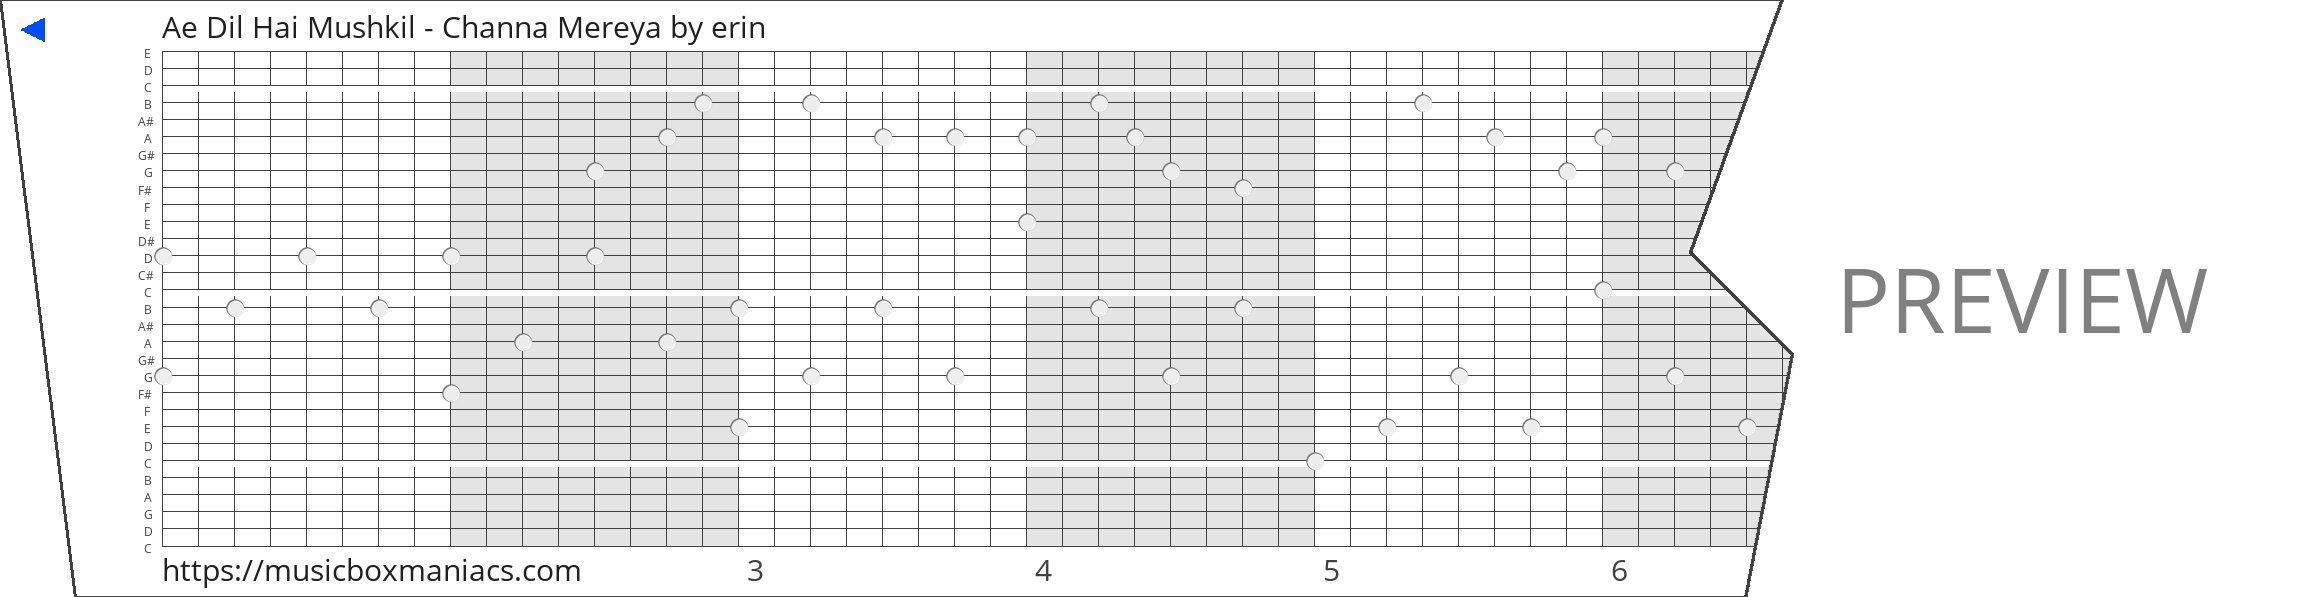 Ae Dil Hai Mushkil - Channa Mereya 30 note music box paper strip